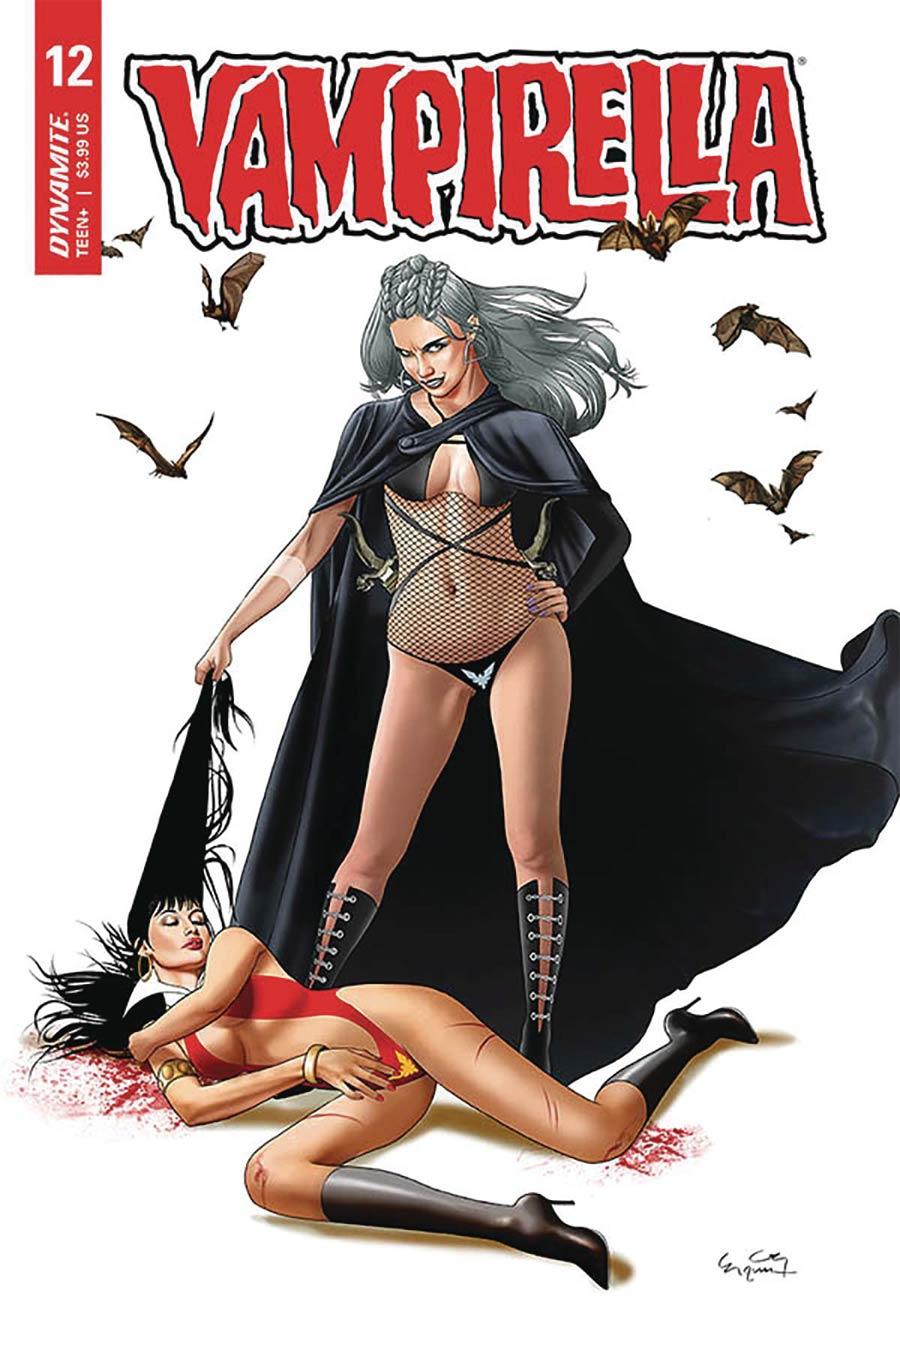 Vampirella Vol 8 #12 Cover D Variant Ergun Gunduz Cover